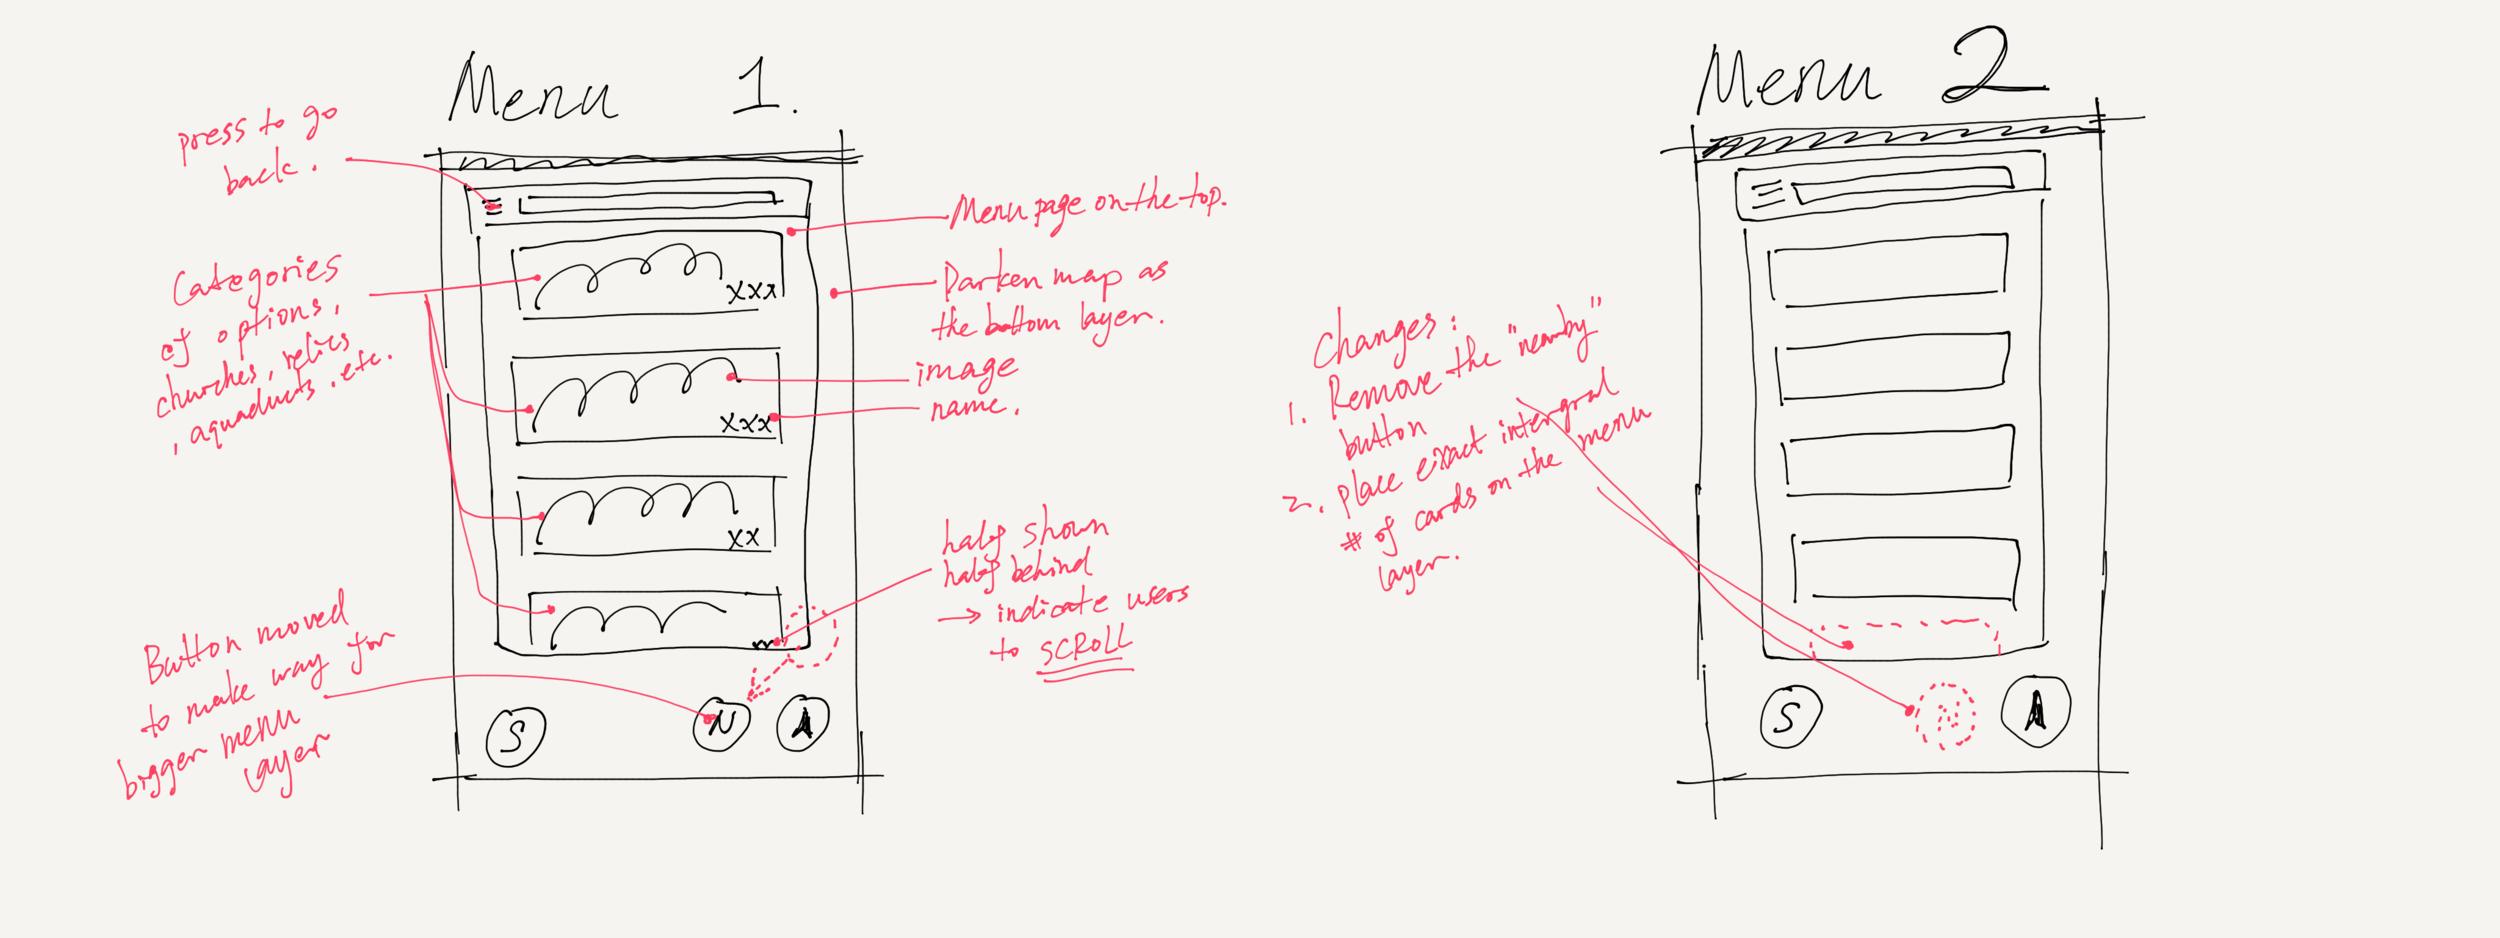 Menu tab wireframe modification